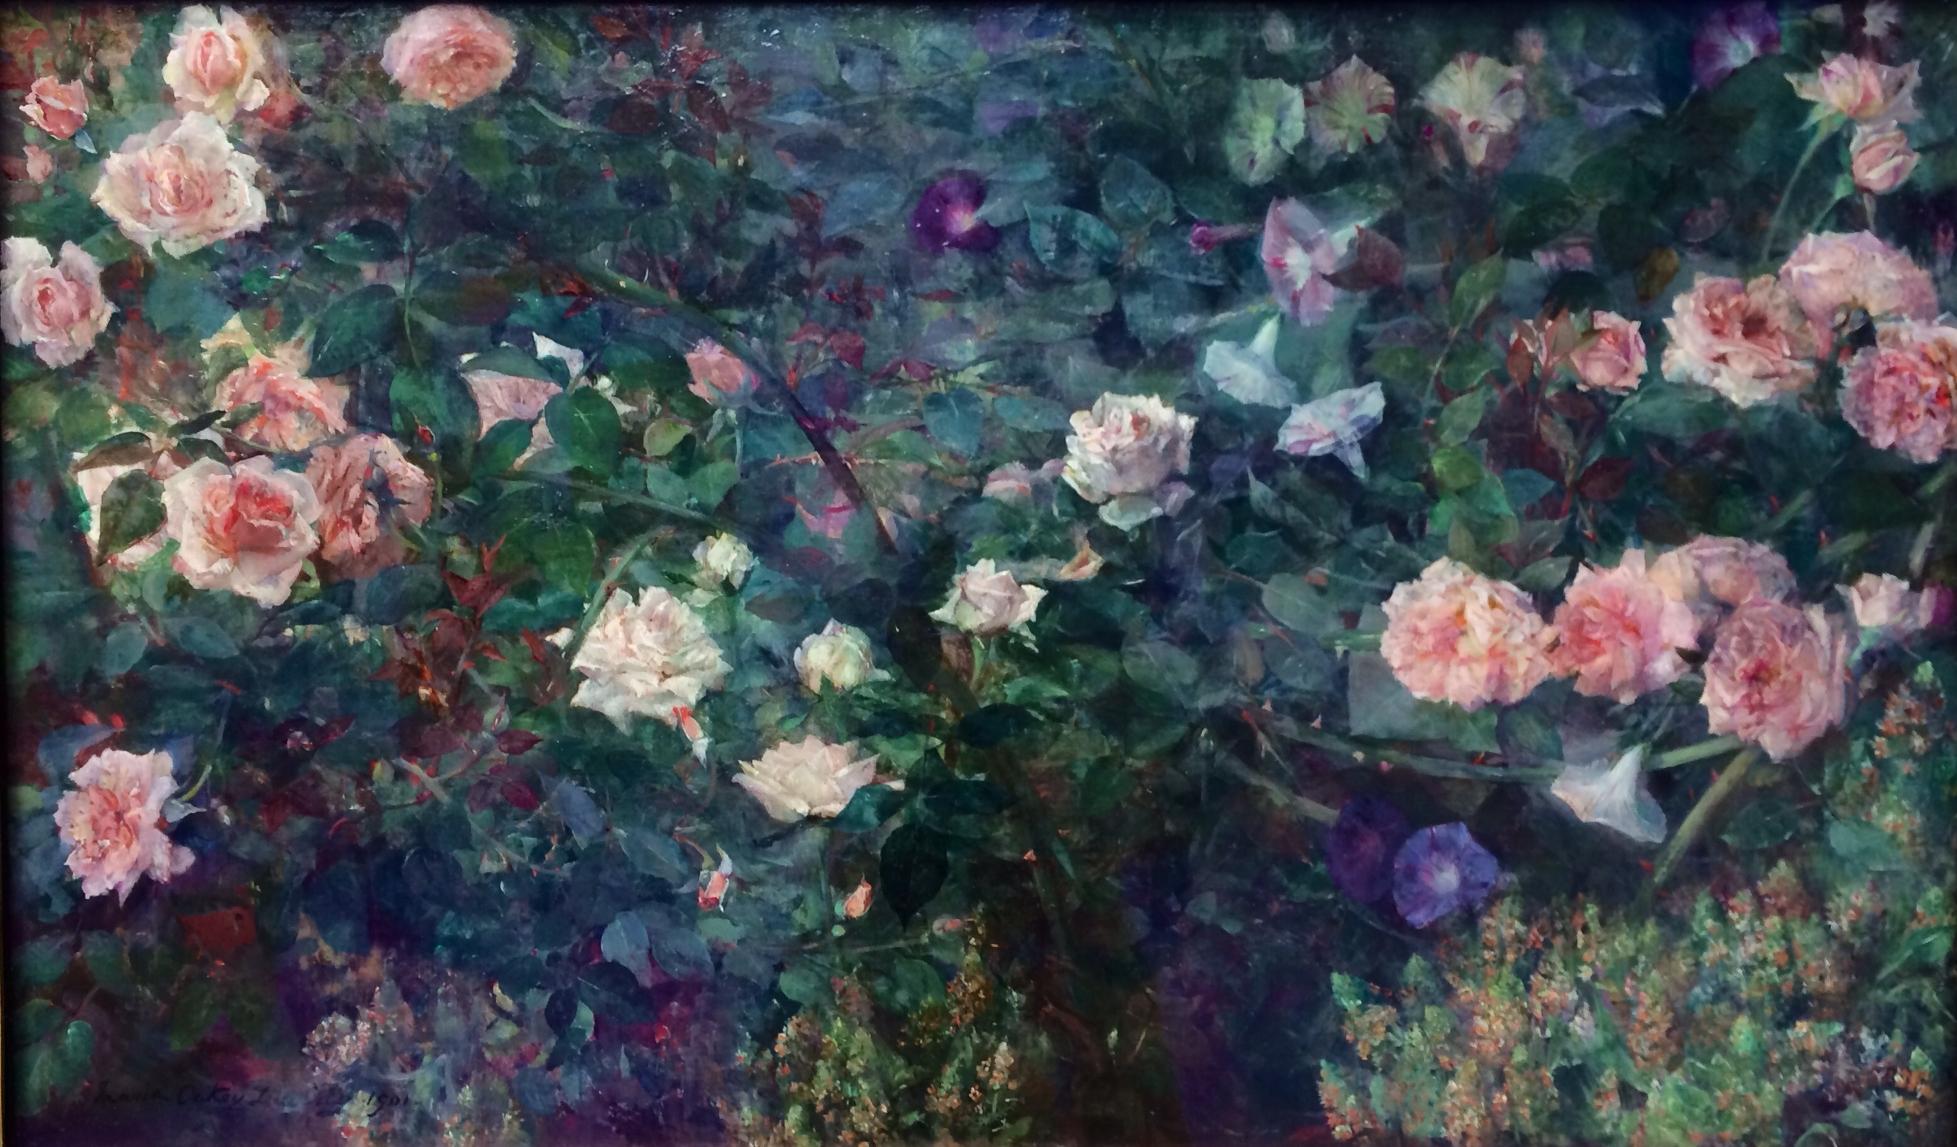 Gardens By Maria: The Artist's Garden (PAFA): Watch The Women Bloom